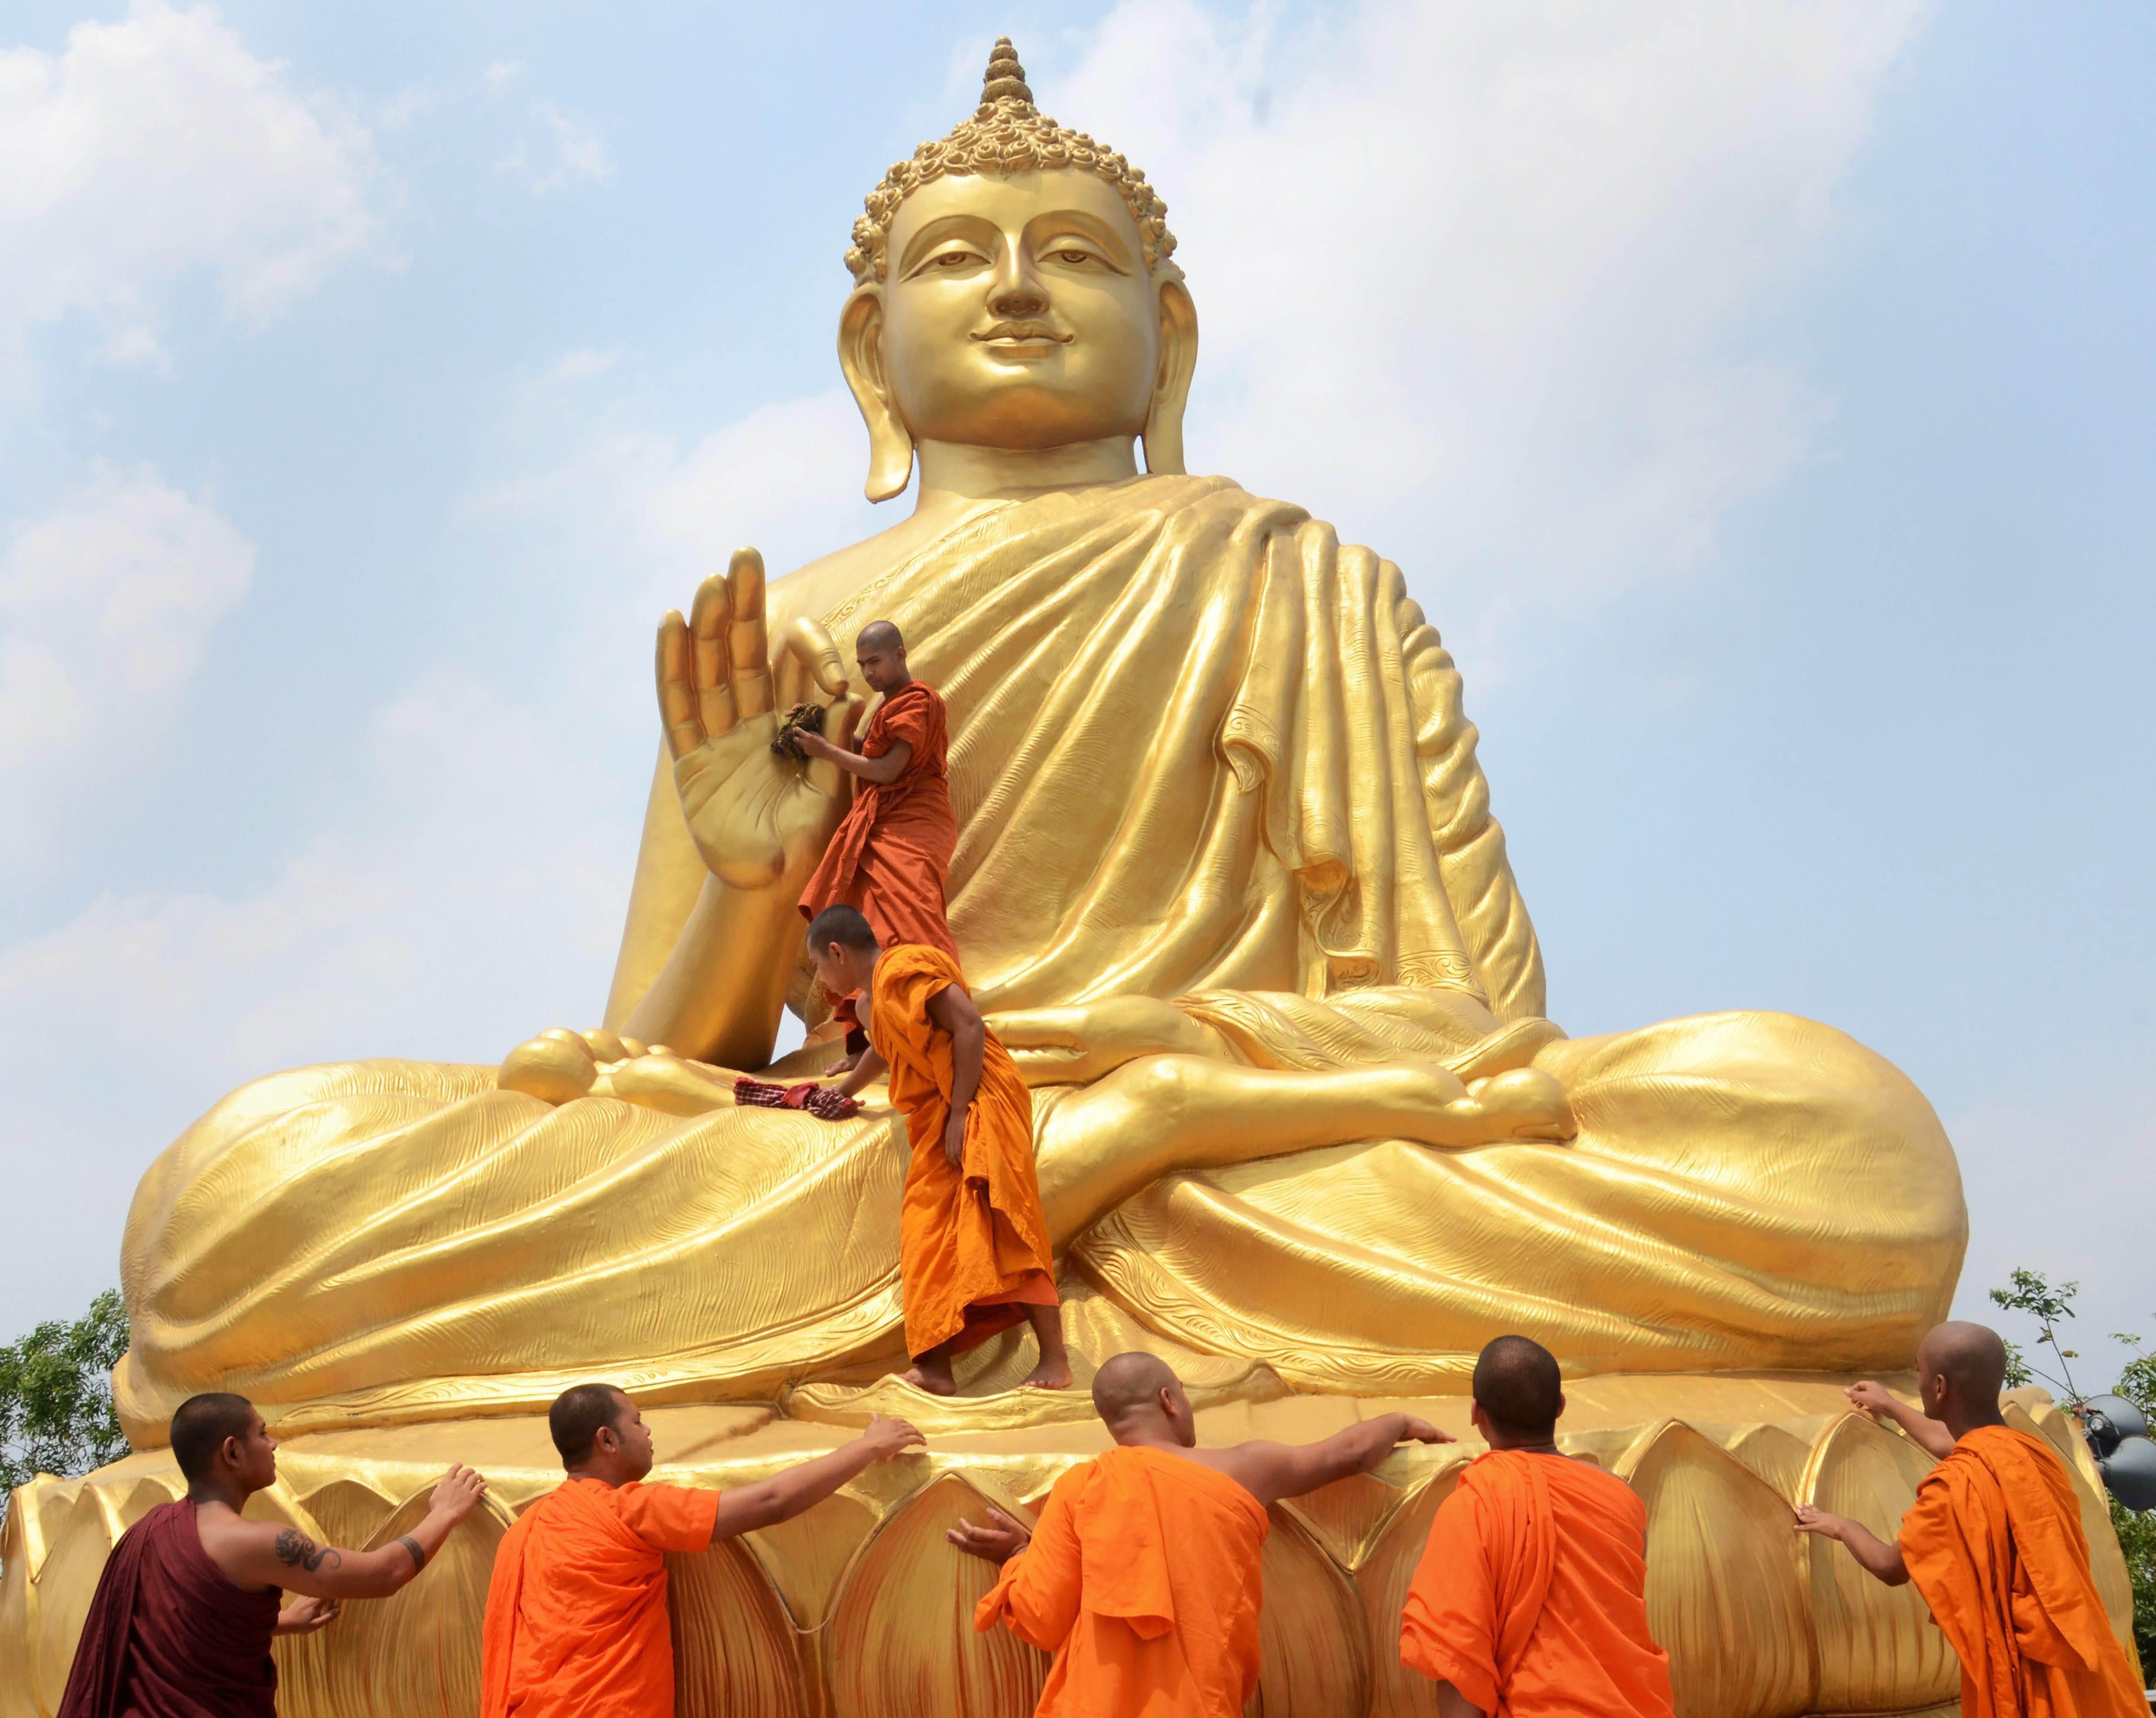 india should reclaim buddha s philosophy and vipassana to build soft